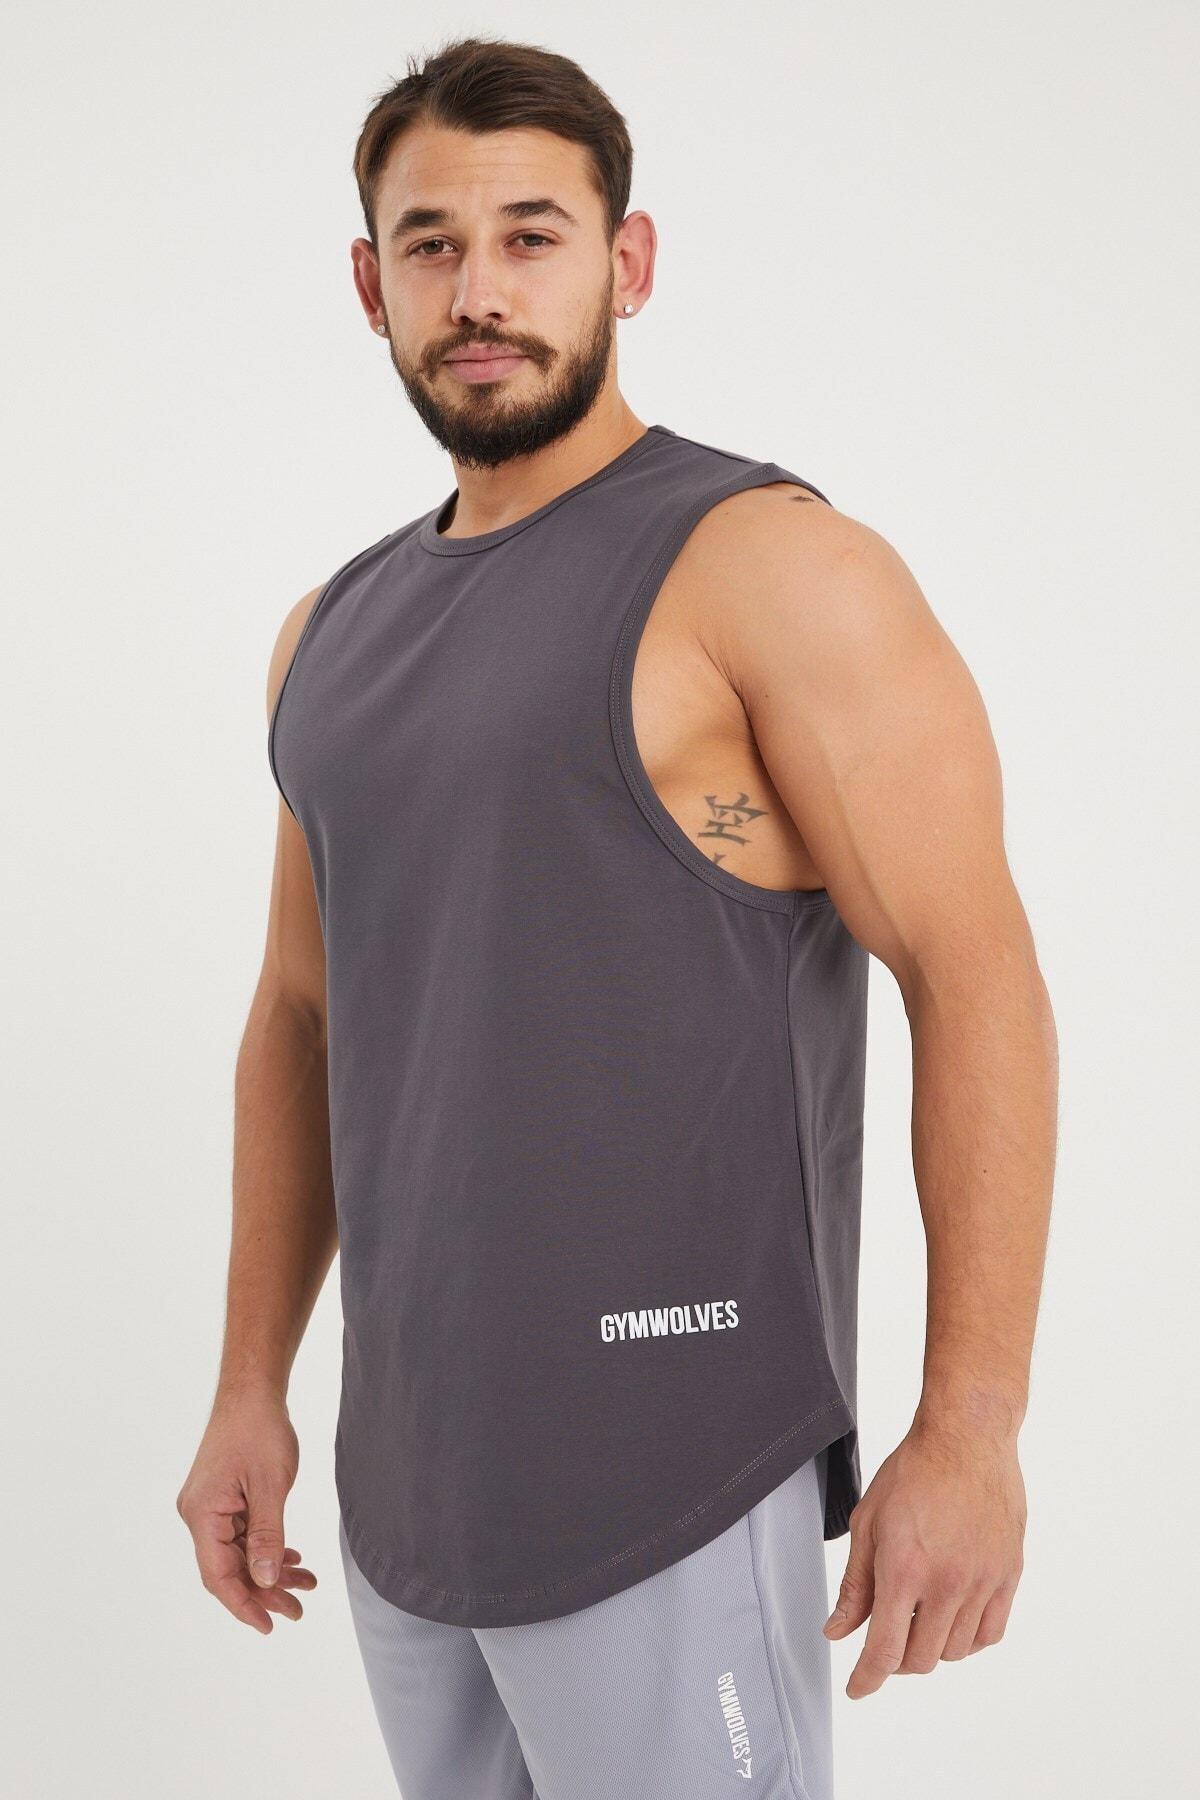 Gymwolves Erkek Kolsuz T-shirt | Füme | Erkek Spor T-shirt | Workout Tanktop | 1